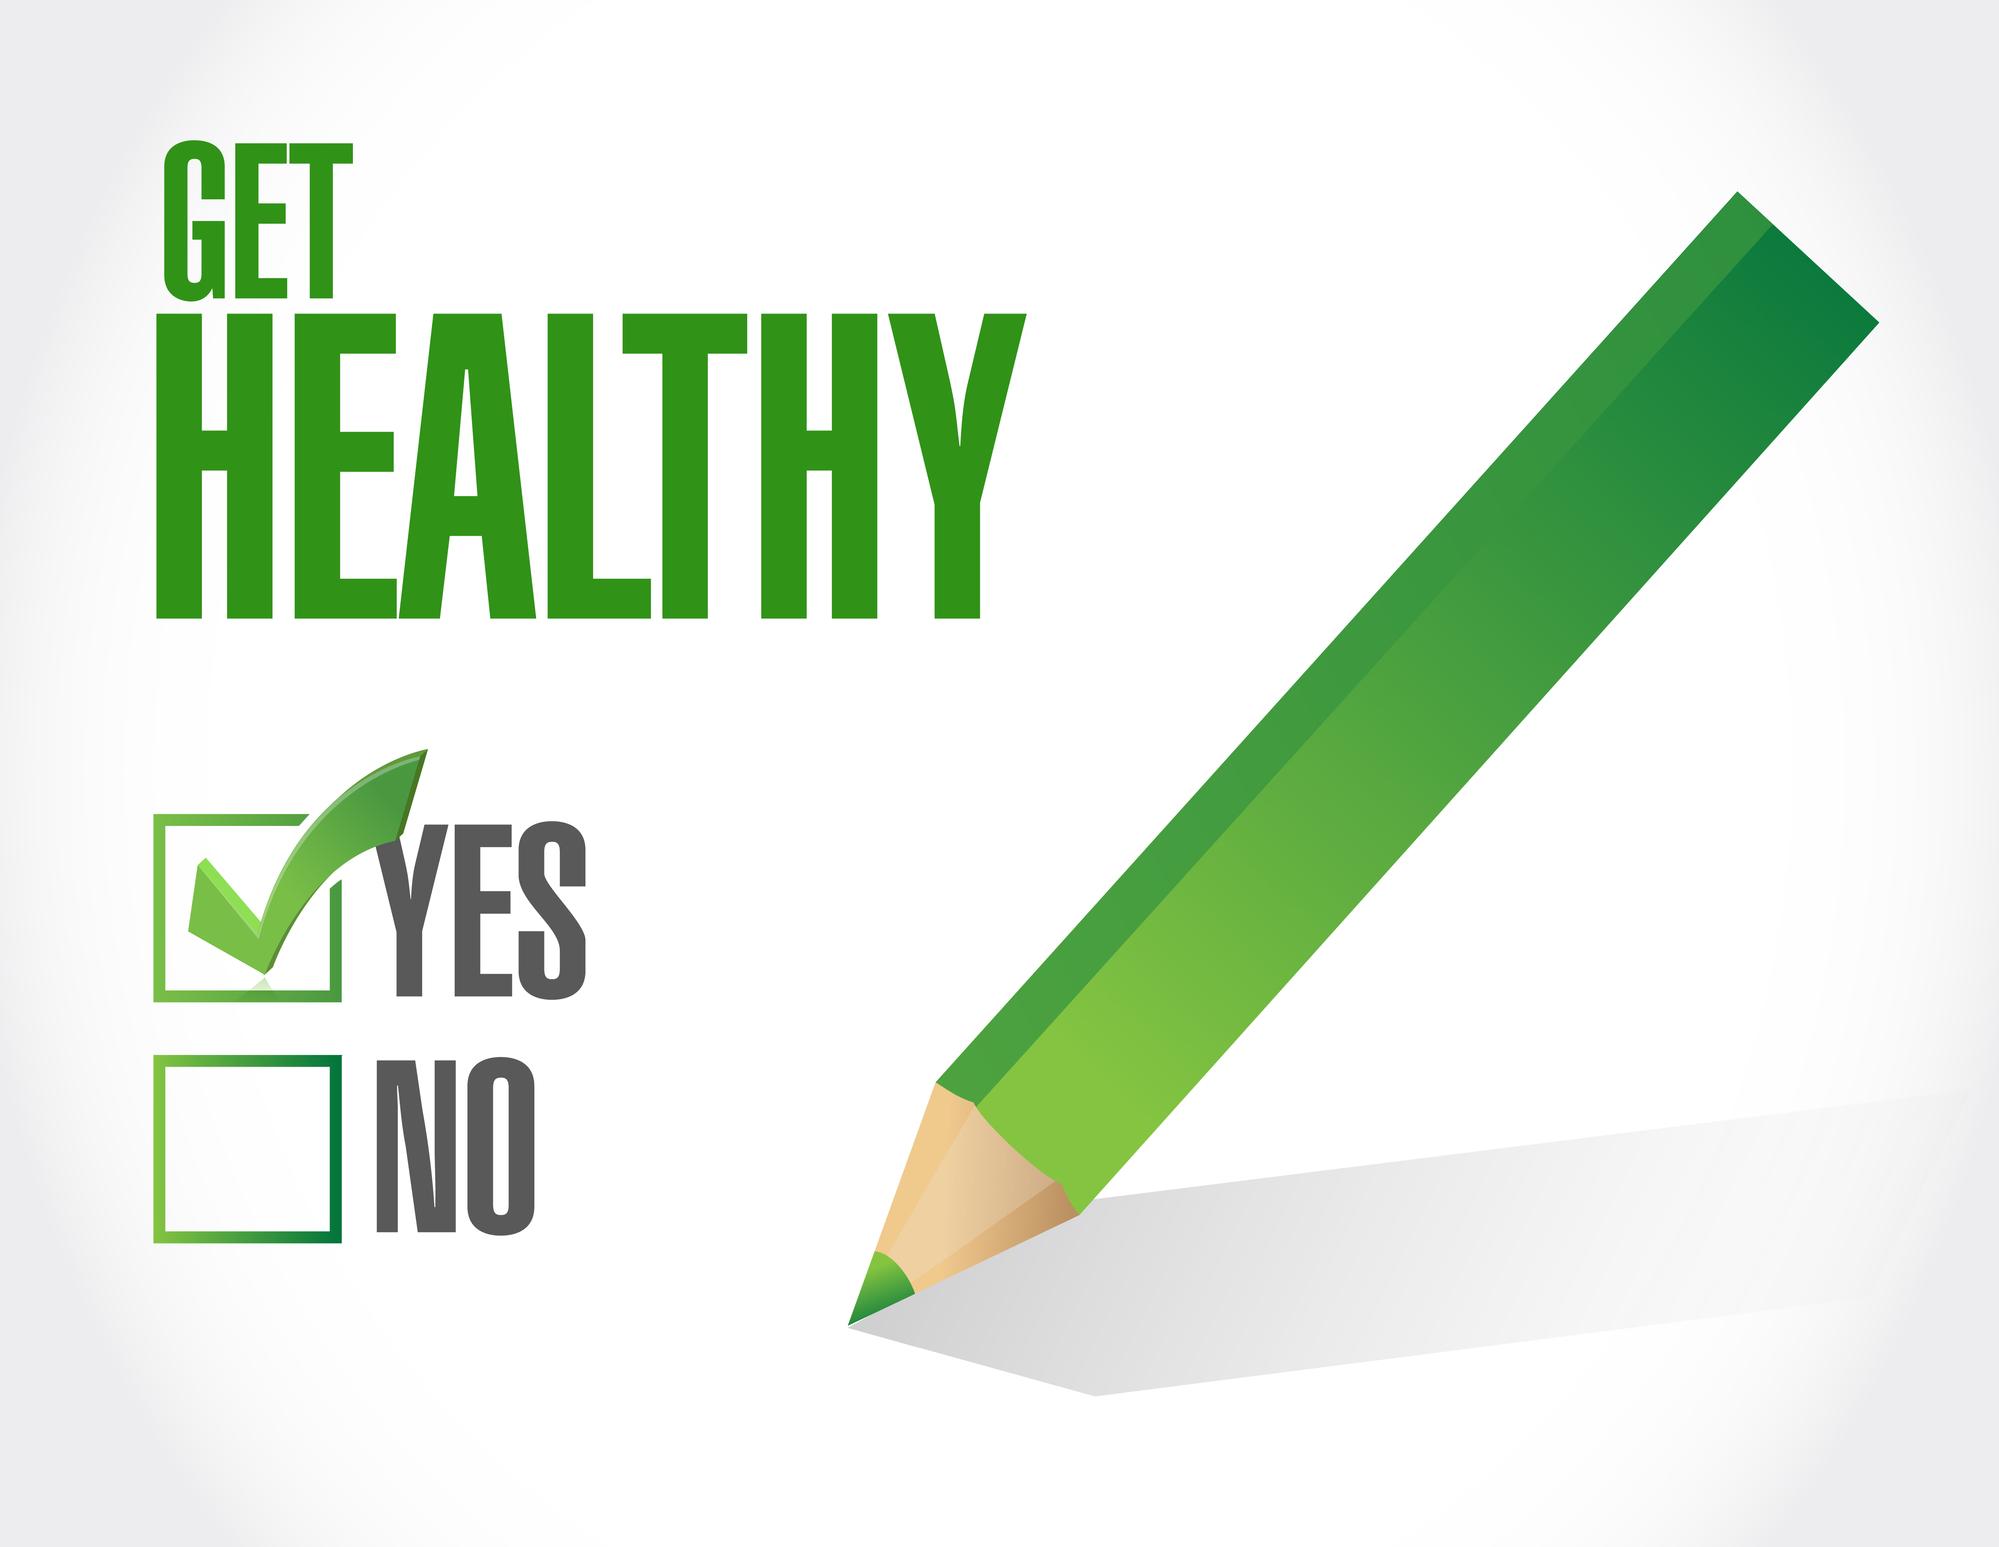 get healthy check mark illustration design over a white background